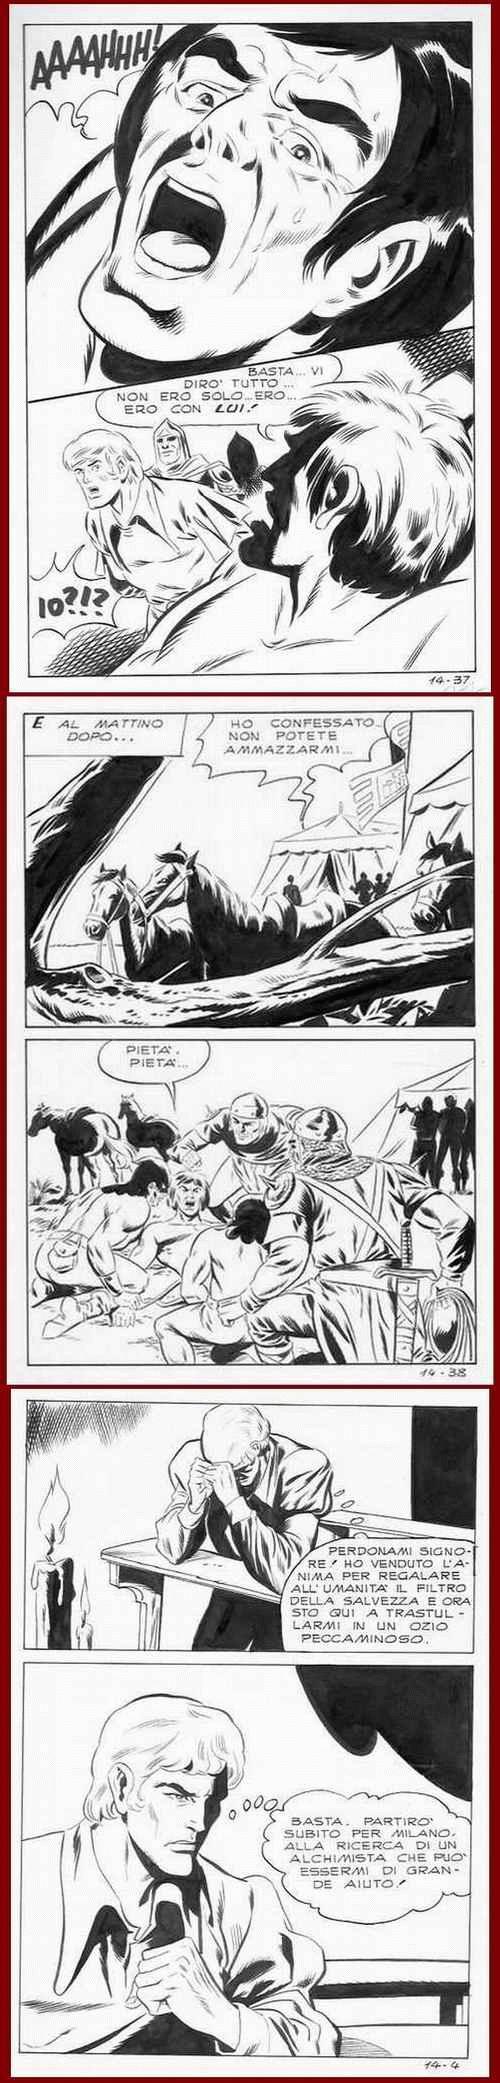 Leone Frollo - COMIC-ART : FOLTER & BUßE - 3 Blatt OriginalFederzeichnungen d.berühmten VENEZIANERS um 1970 kopen? Bied vanaf 65!